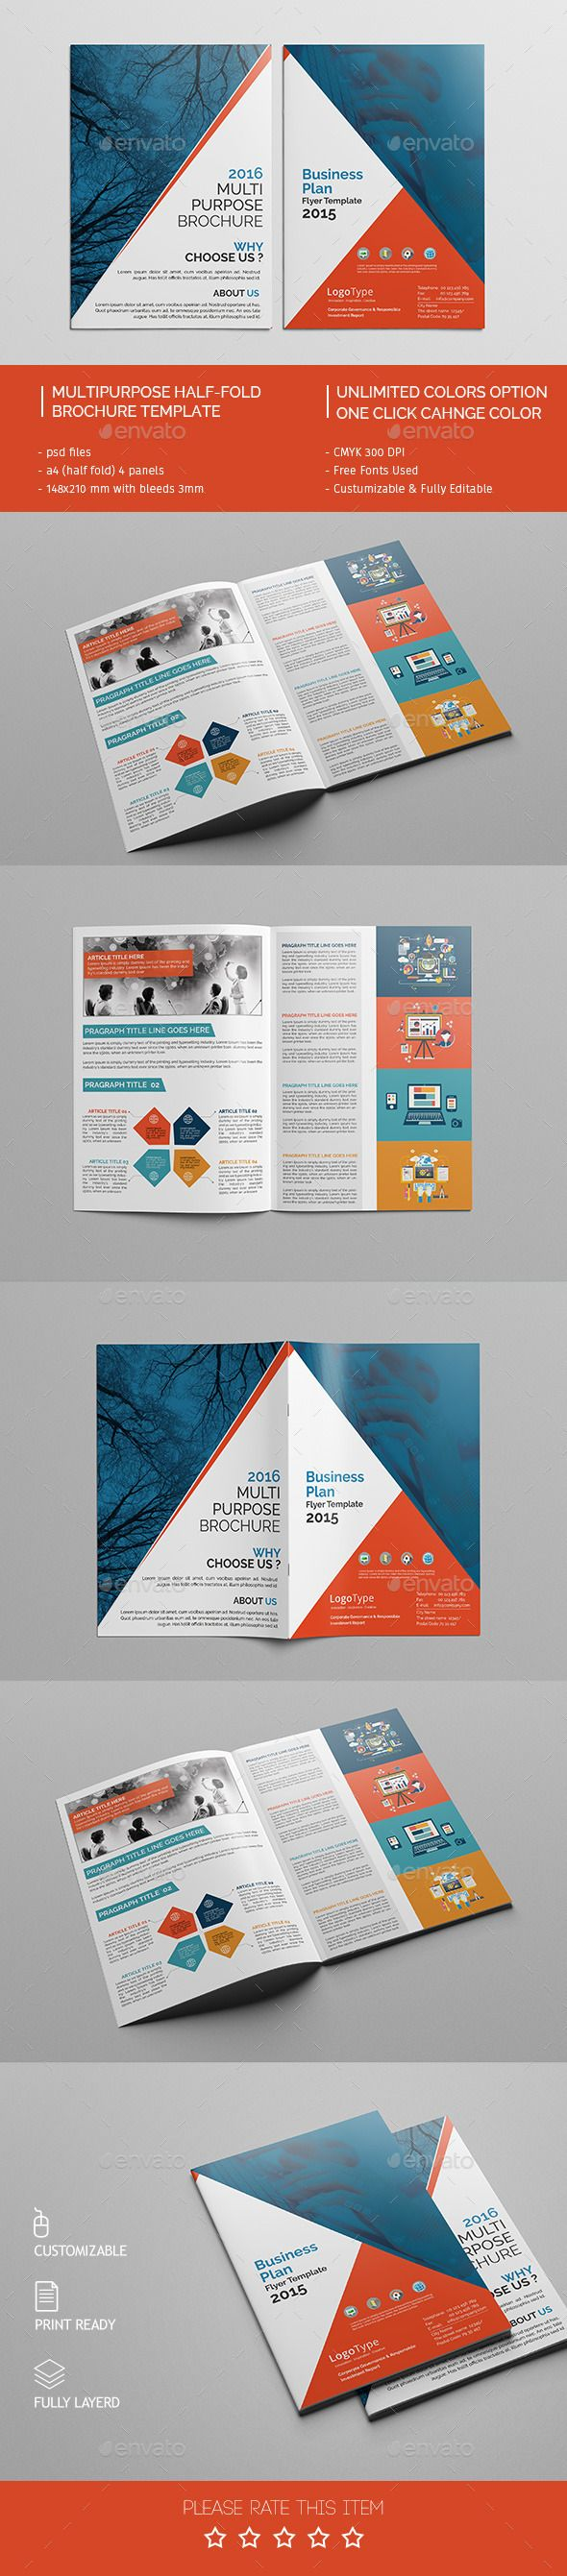 Corporate Bi-fold Brochure Template PSD #design Download: http://graphicriver.net/item/corporate-bifold-brochure-template-06/14145241?ref=ksioks